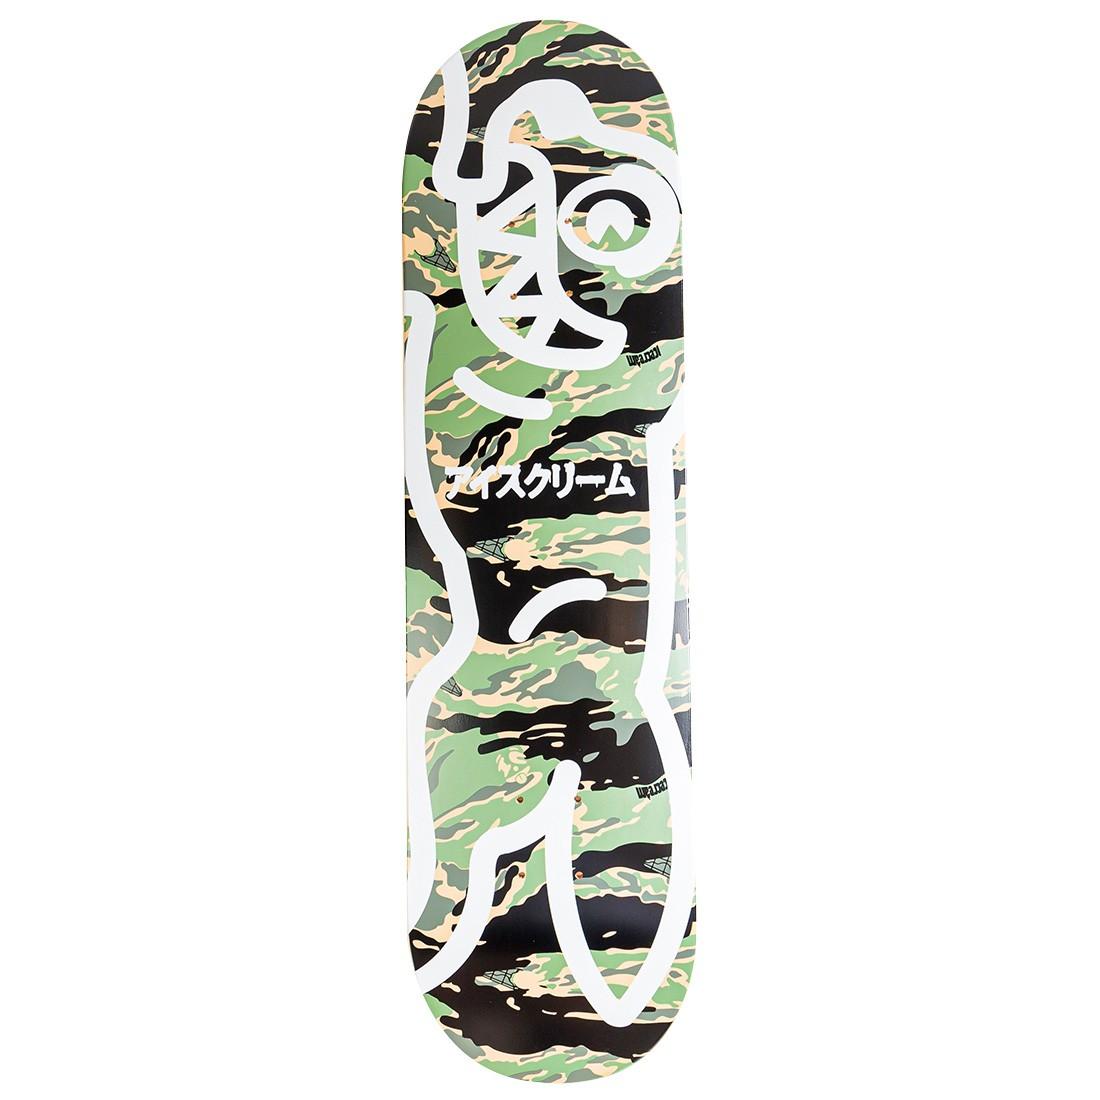 Ice Cream Stash Skateboard Deck (camo / black)